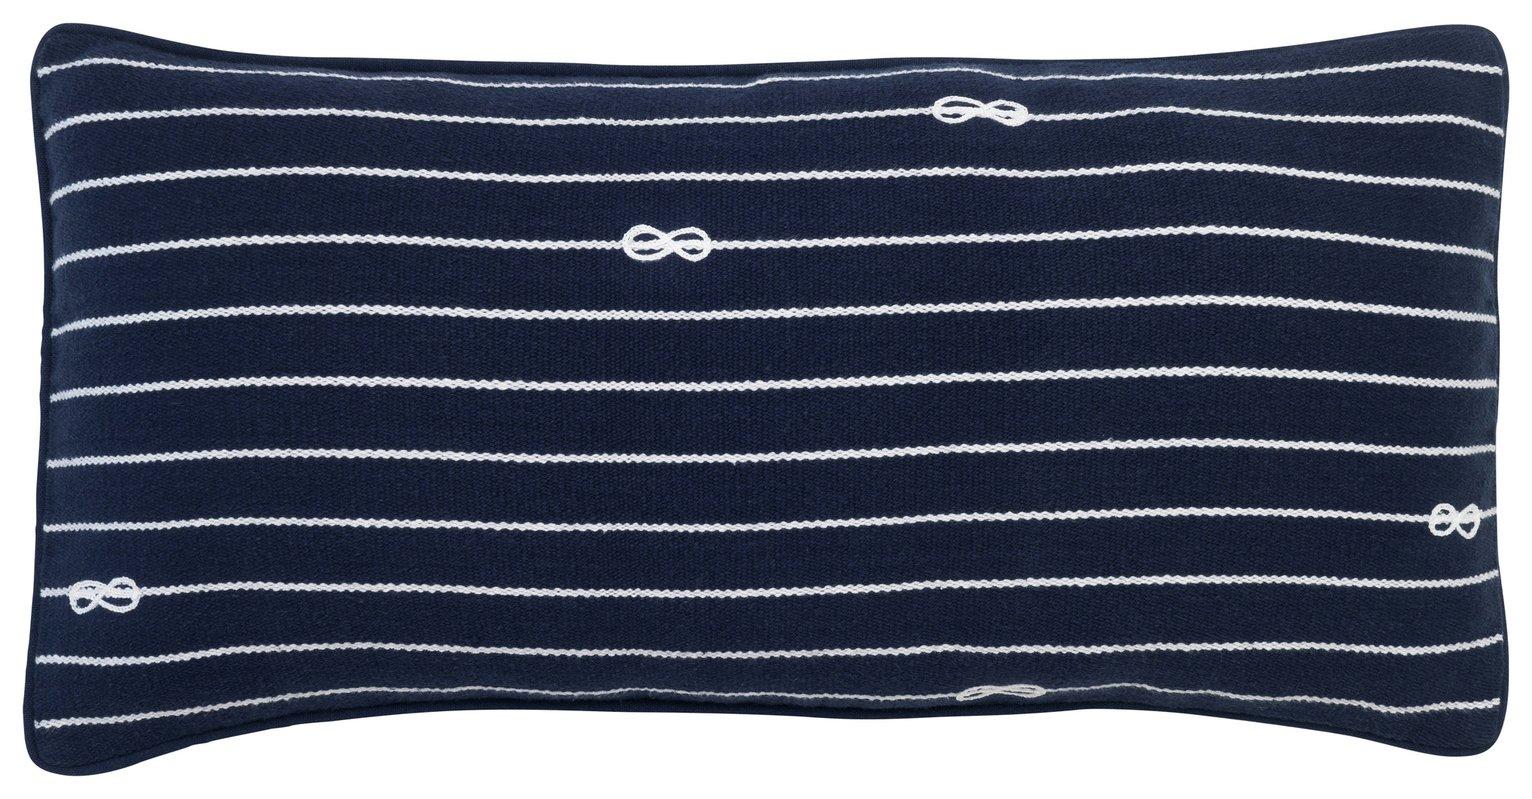 Sainsbury's Home Knot Stripe Cushion